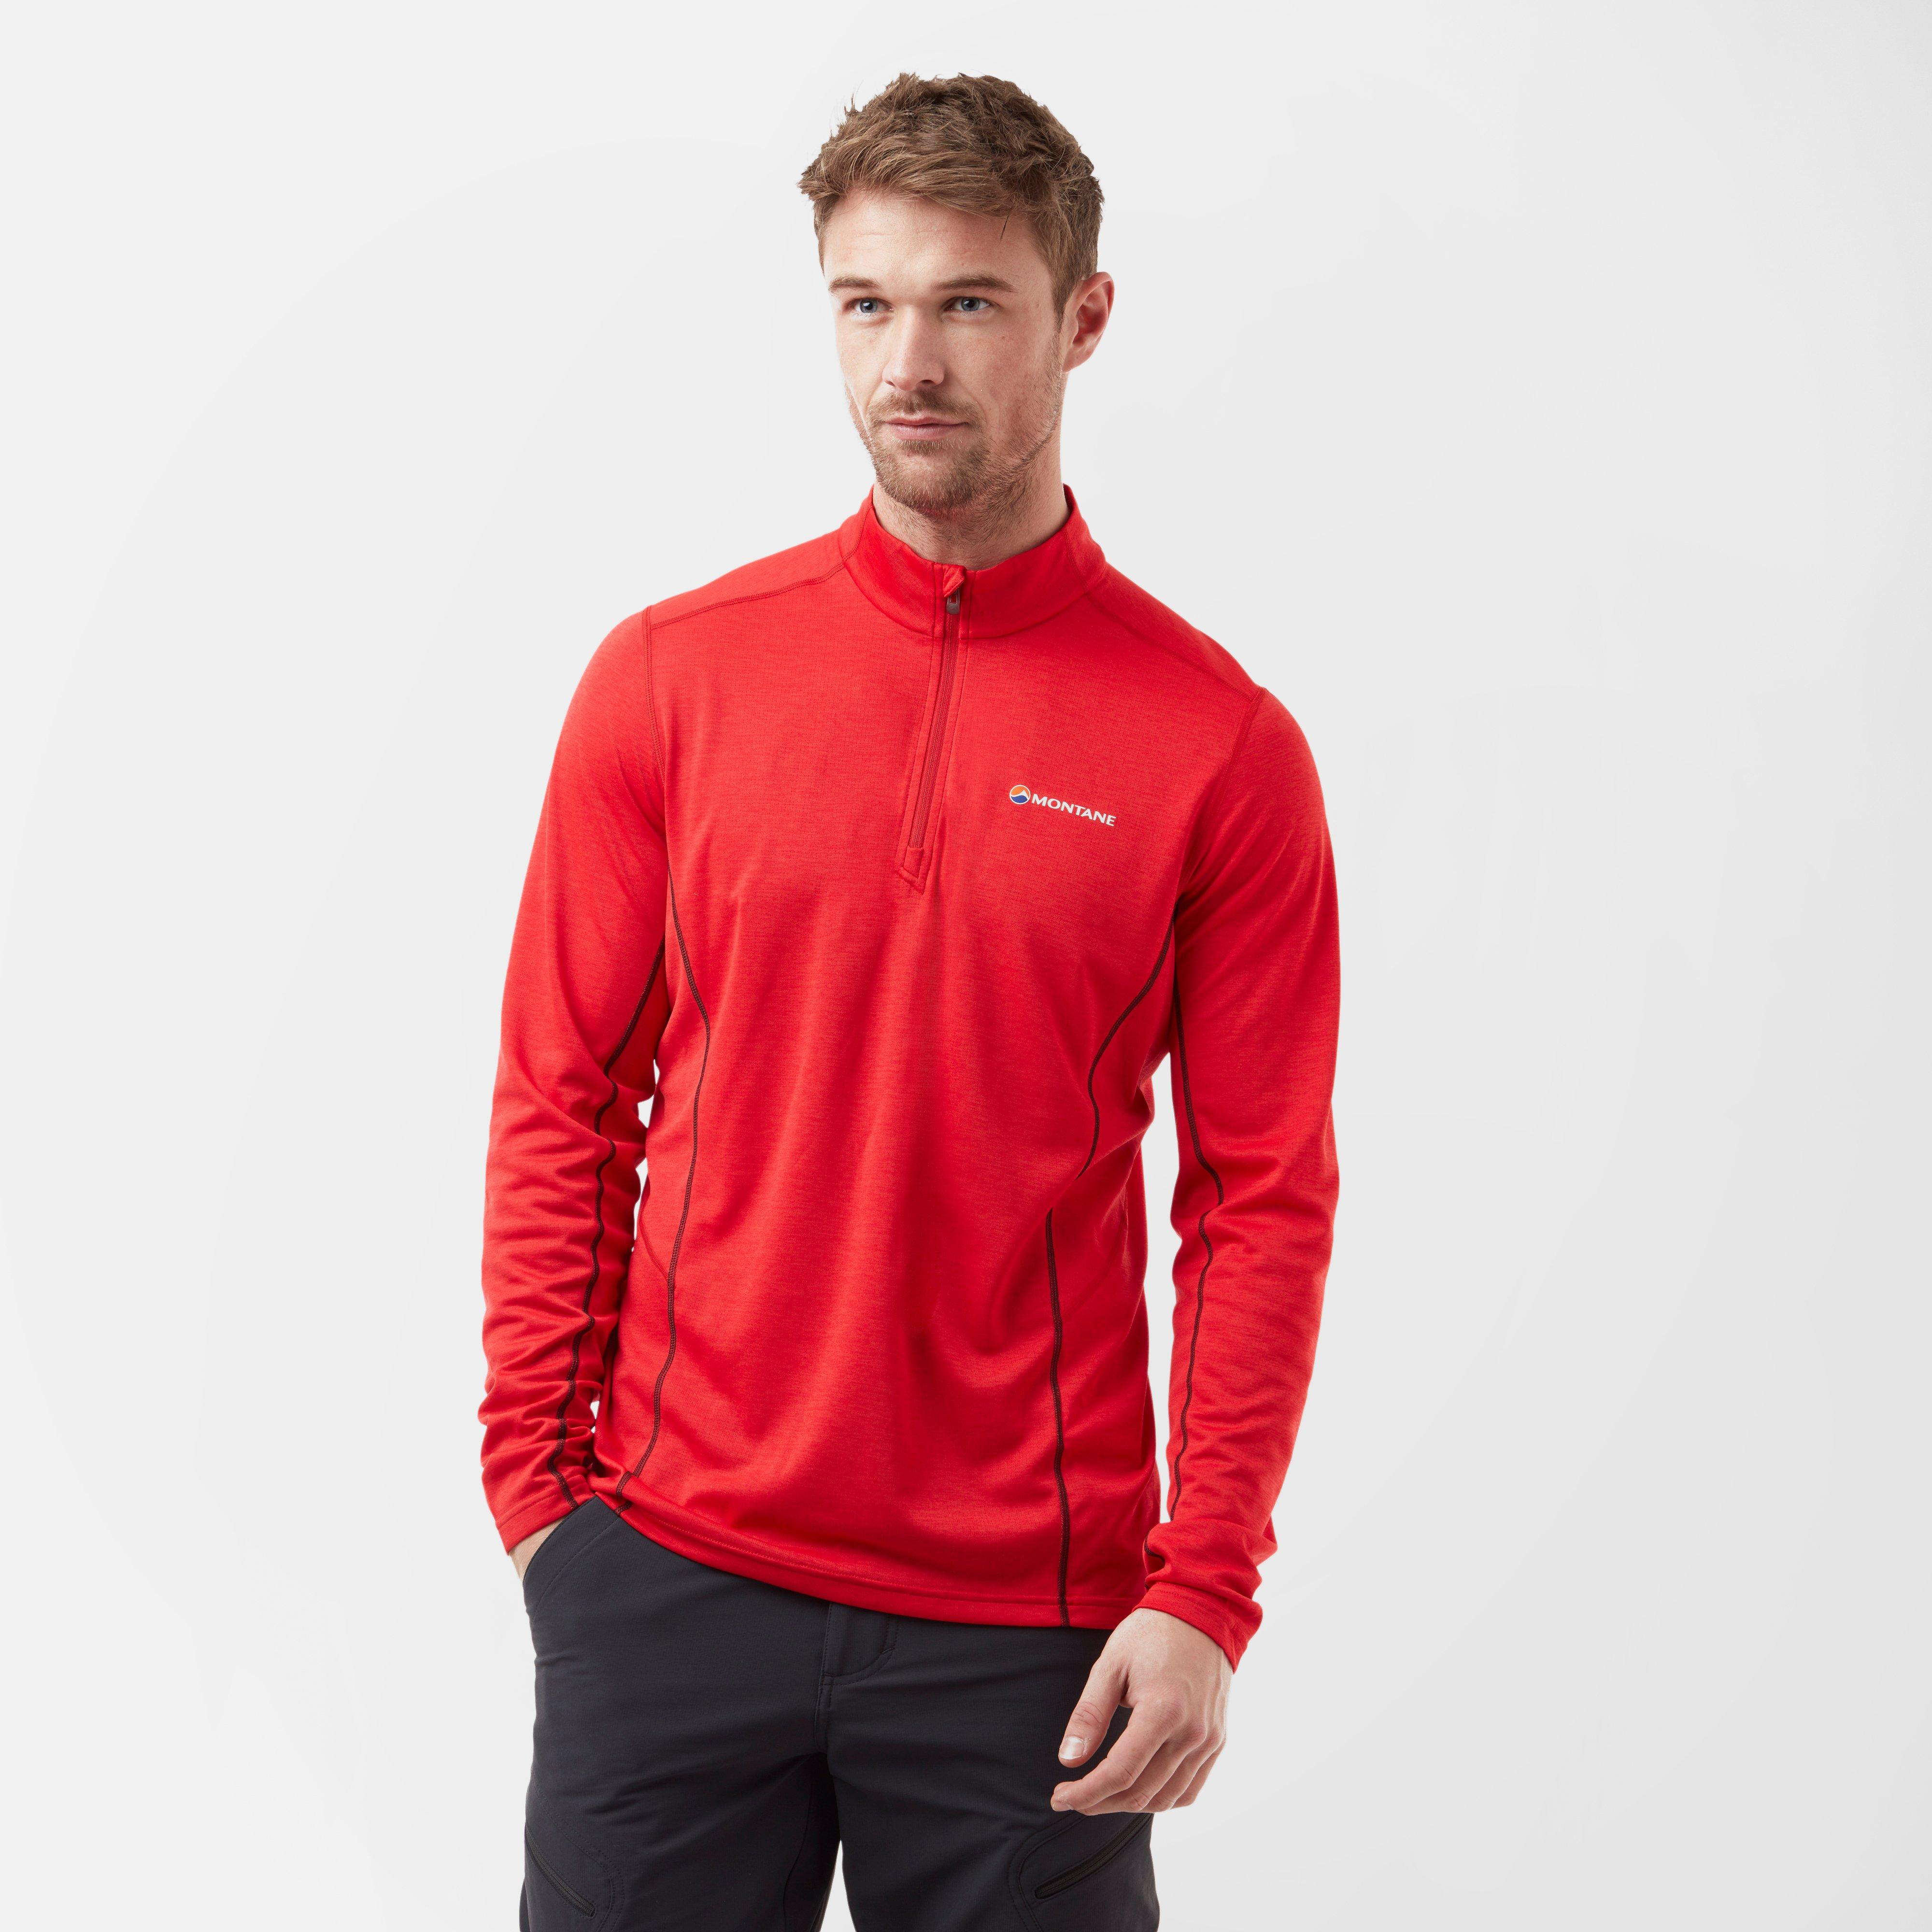 Montane Montane Mens Dart ¼ Zip Top - Red, Red